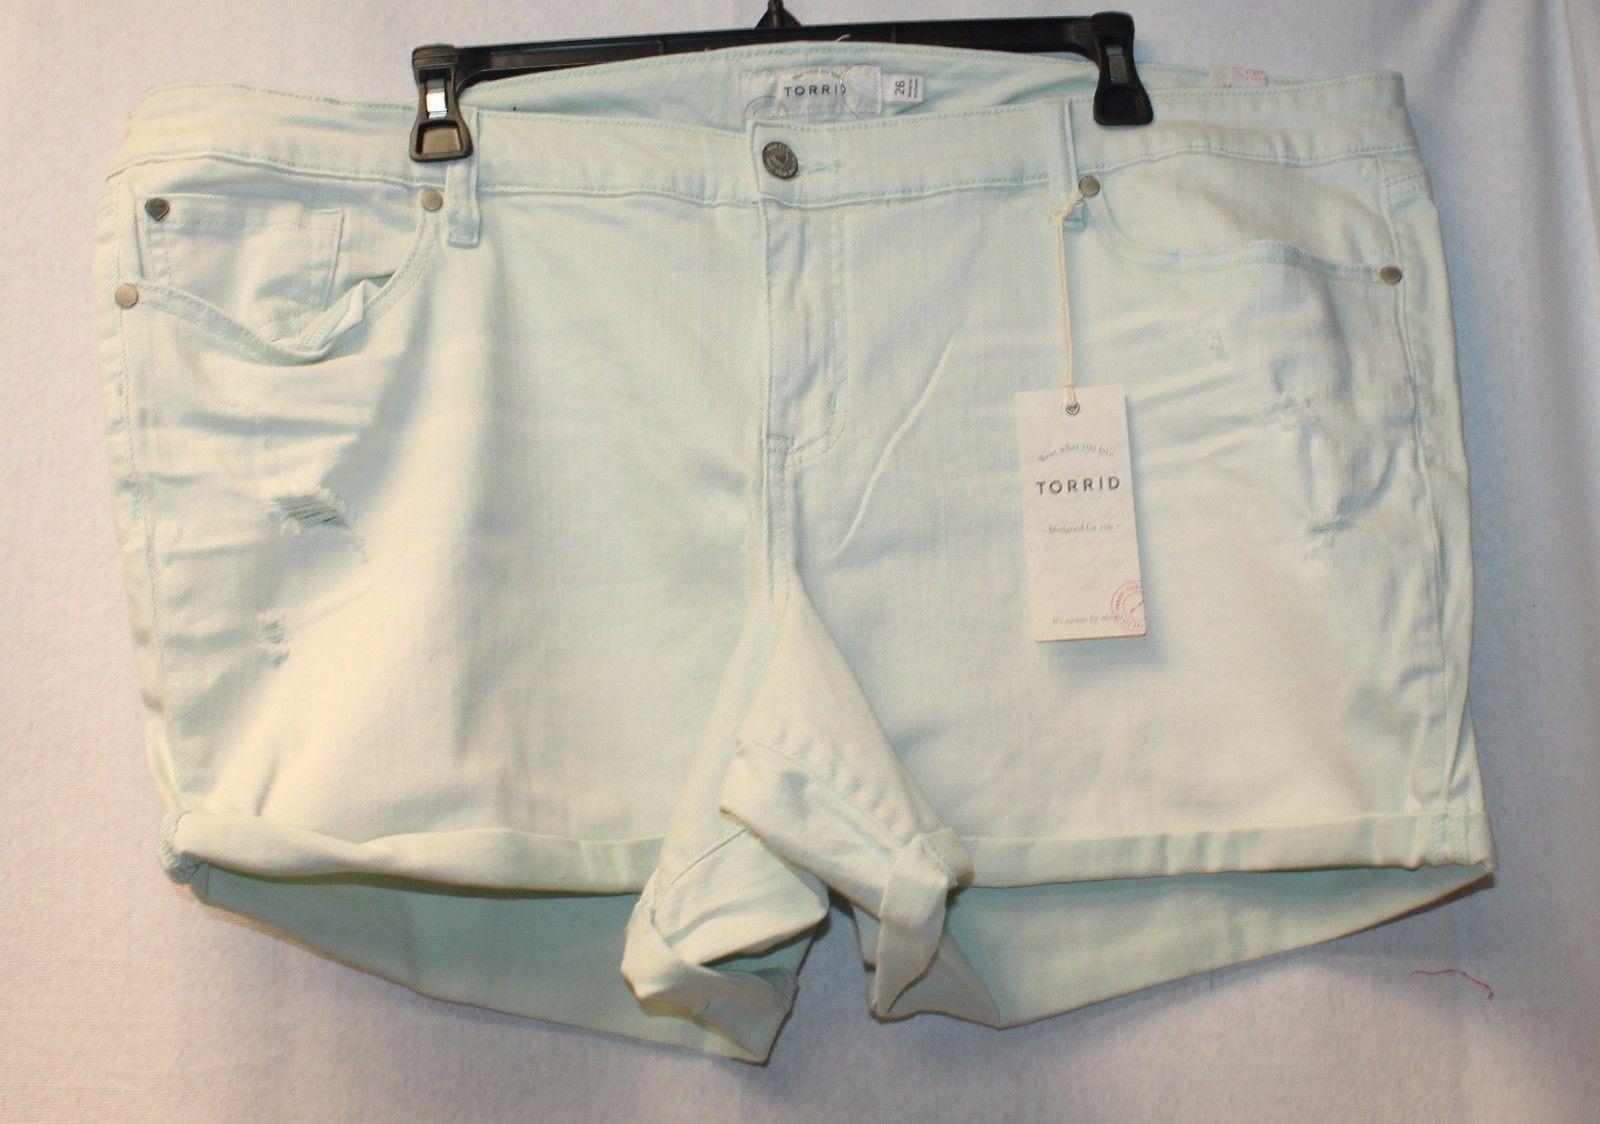 9401191c7bd New Torrid Womens Plus Size 28W 28 Mint and 50 similar items. 57